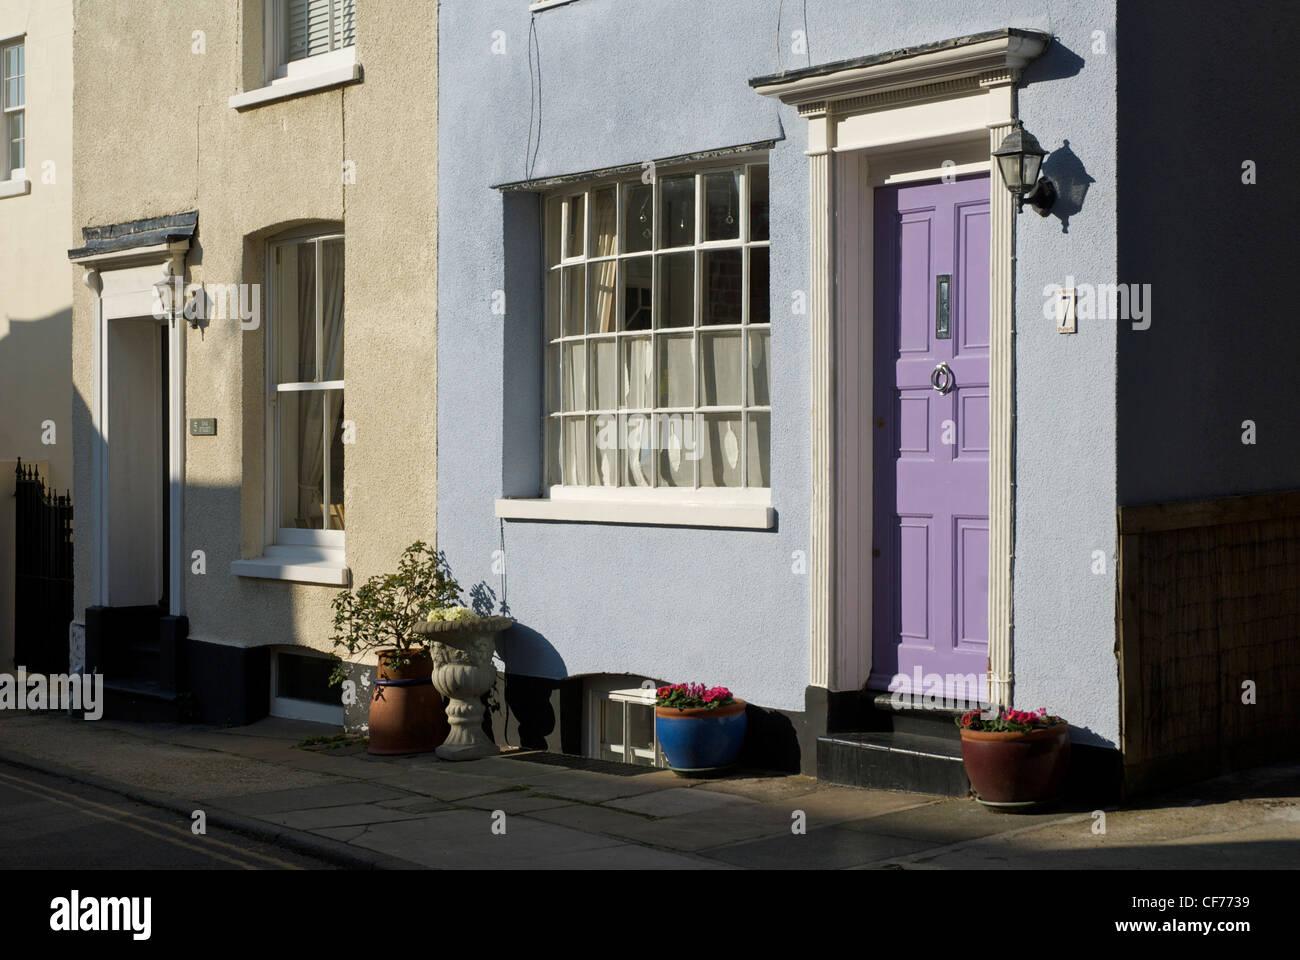 Casa en Deal, Kent, Inglaterra, Reino Unido. Imagen De Stock